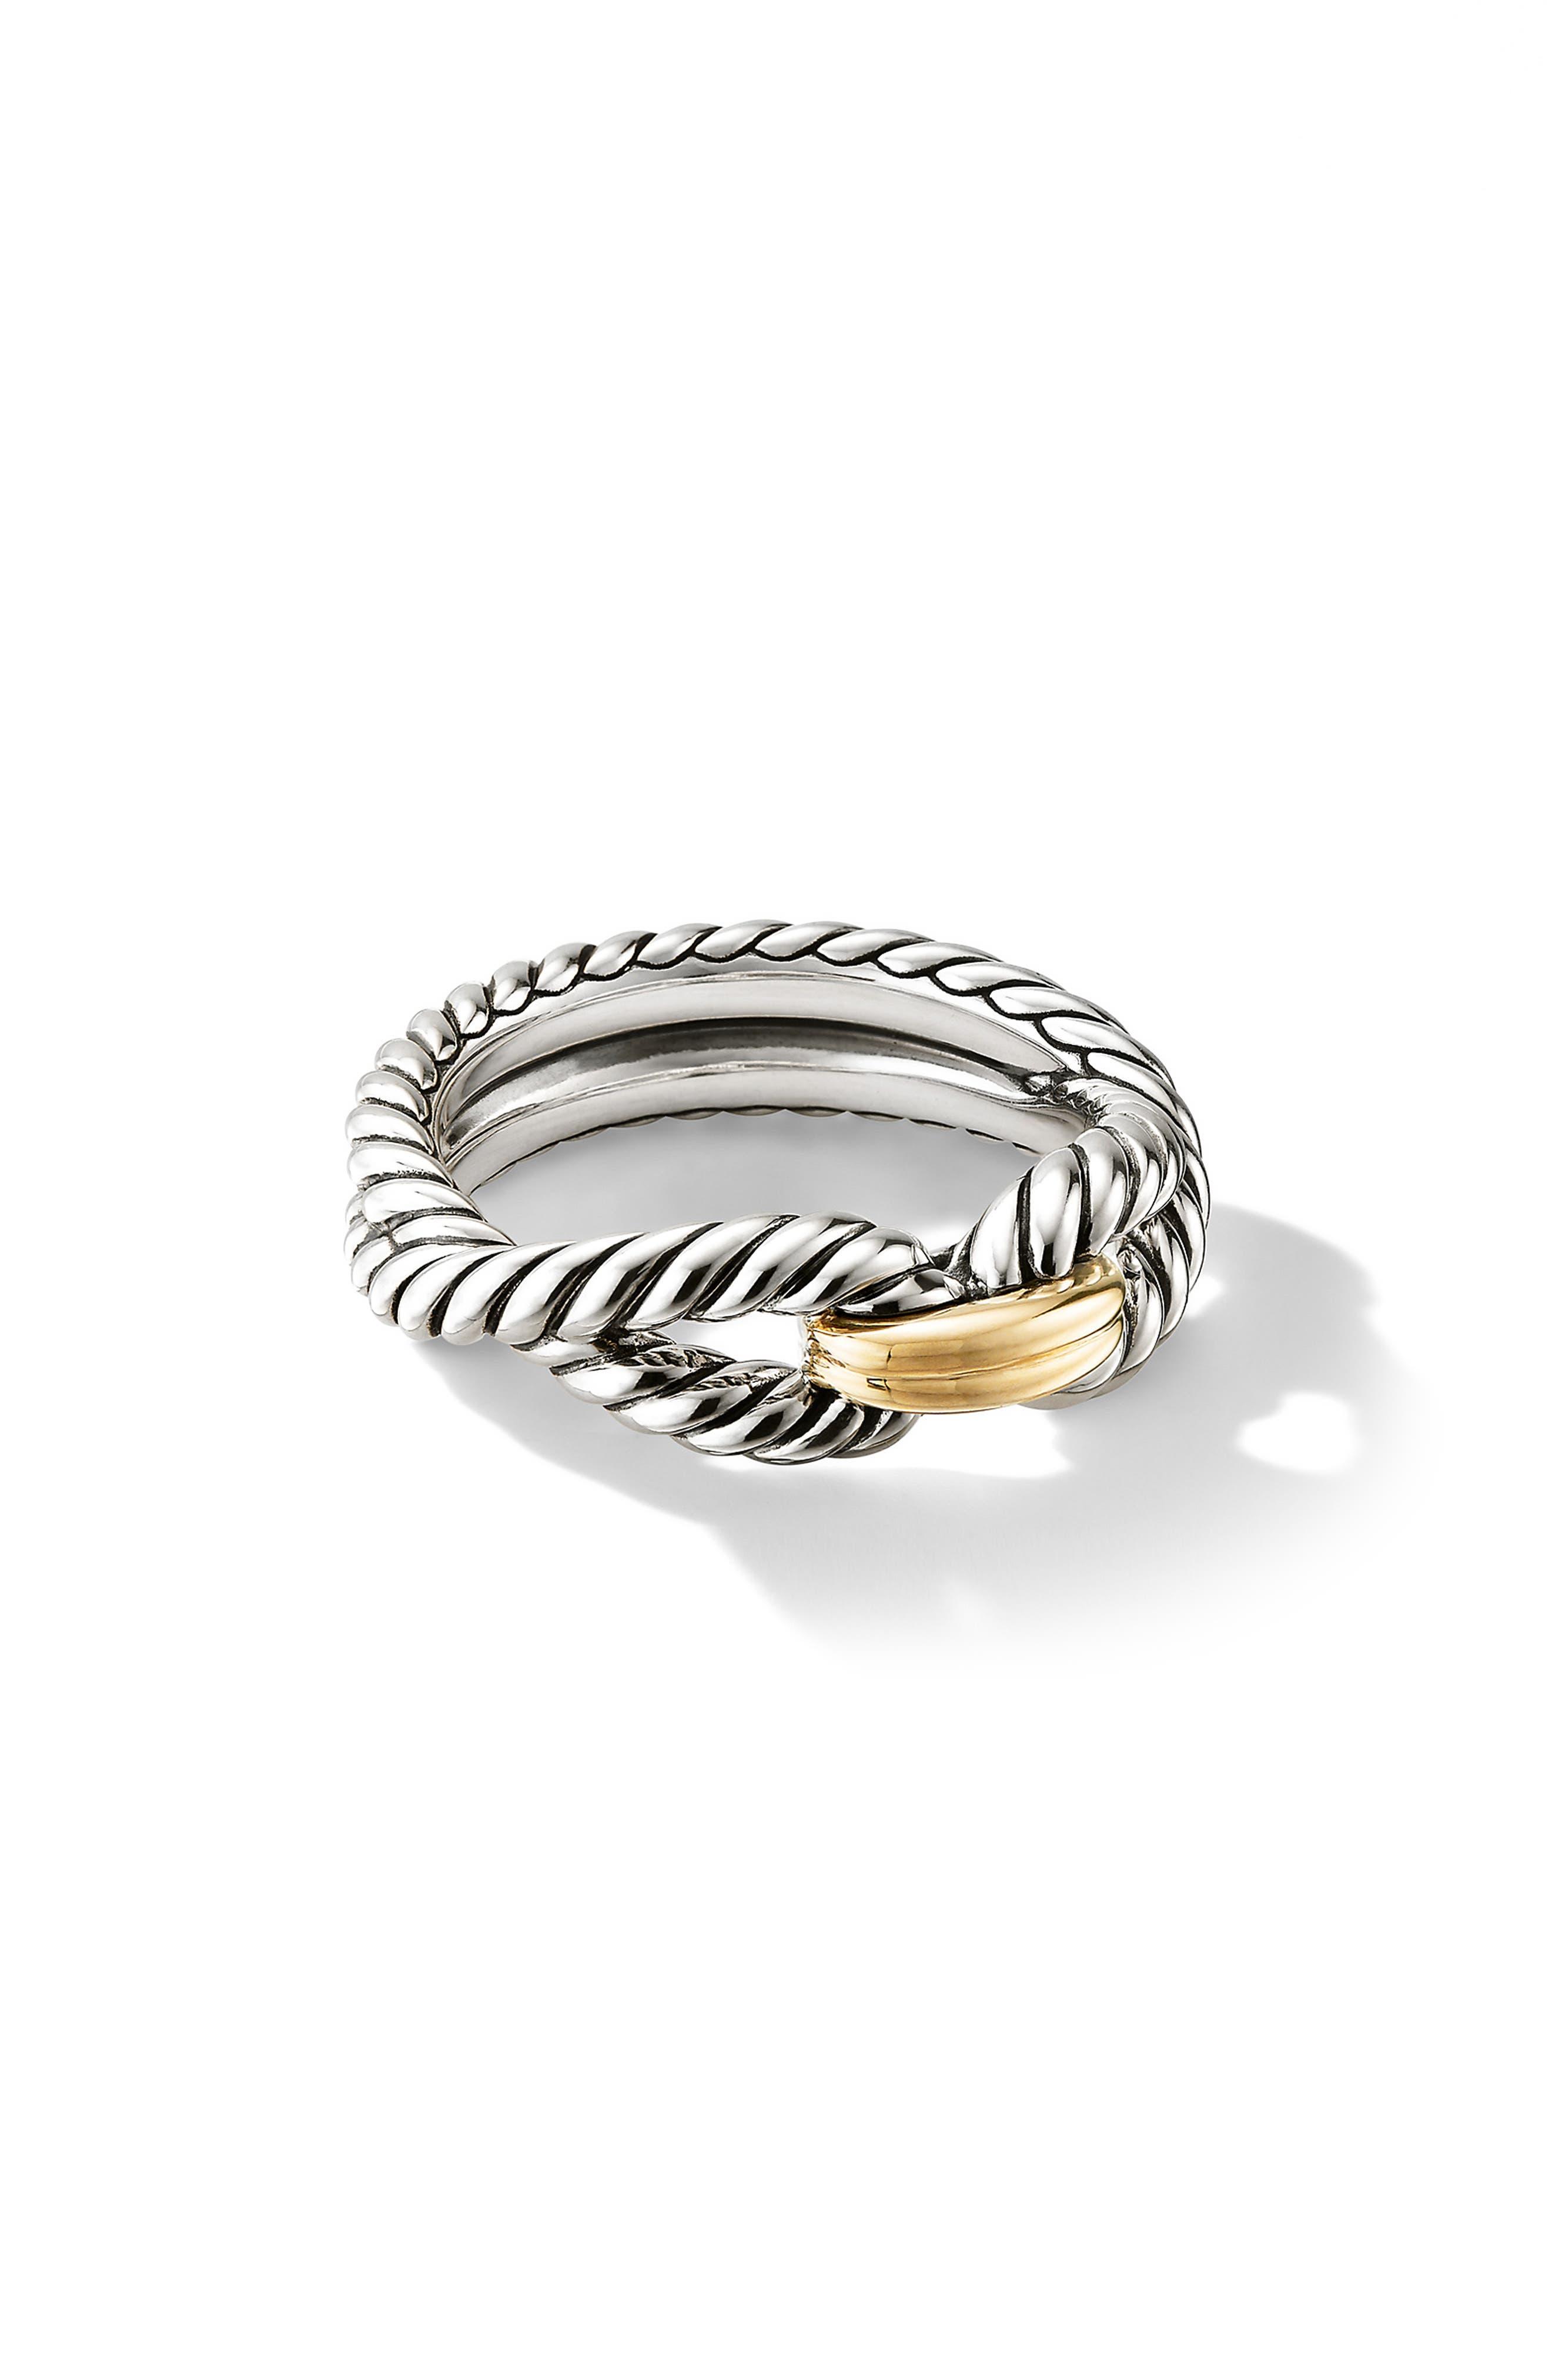 DAVID YURMAN, Cable Loop Ring with 18K Gold, Main thumbnail 1, color, YELLOW GOLD/ STERLING SILVER